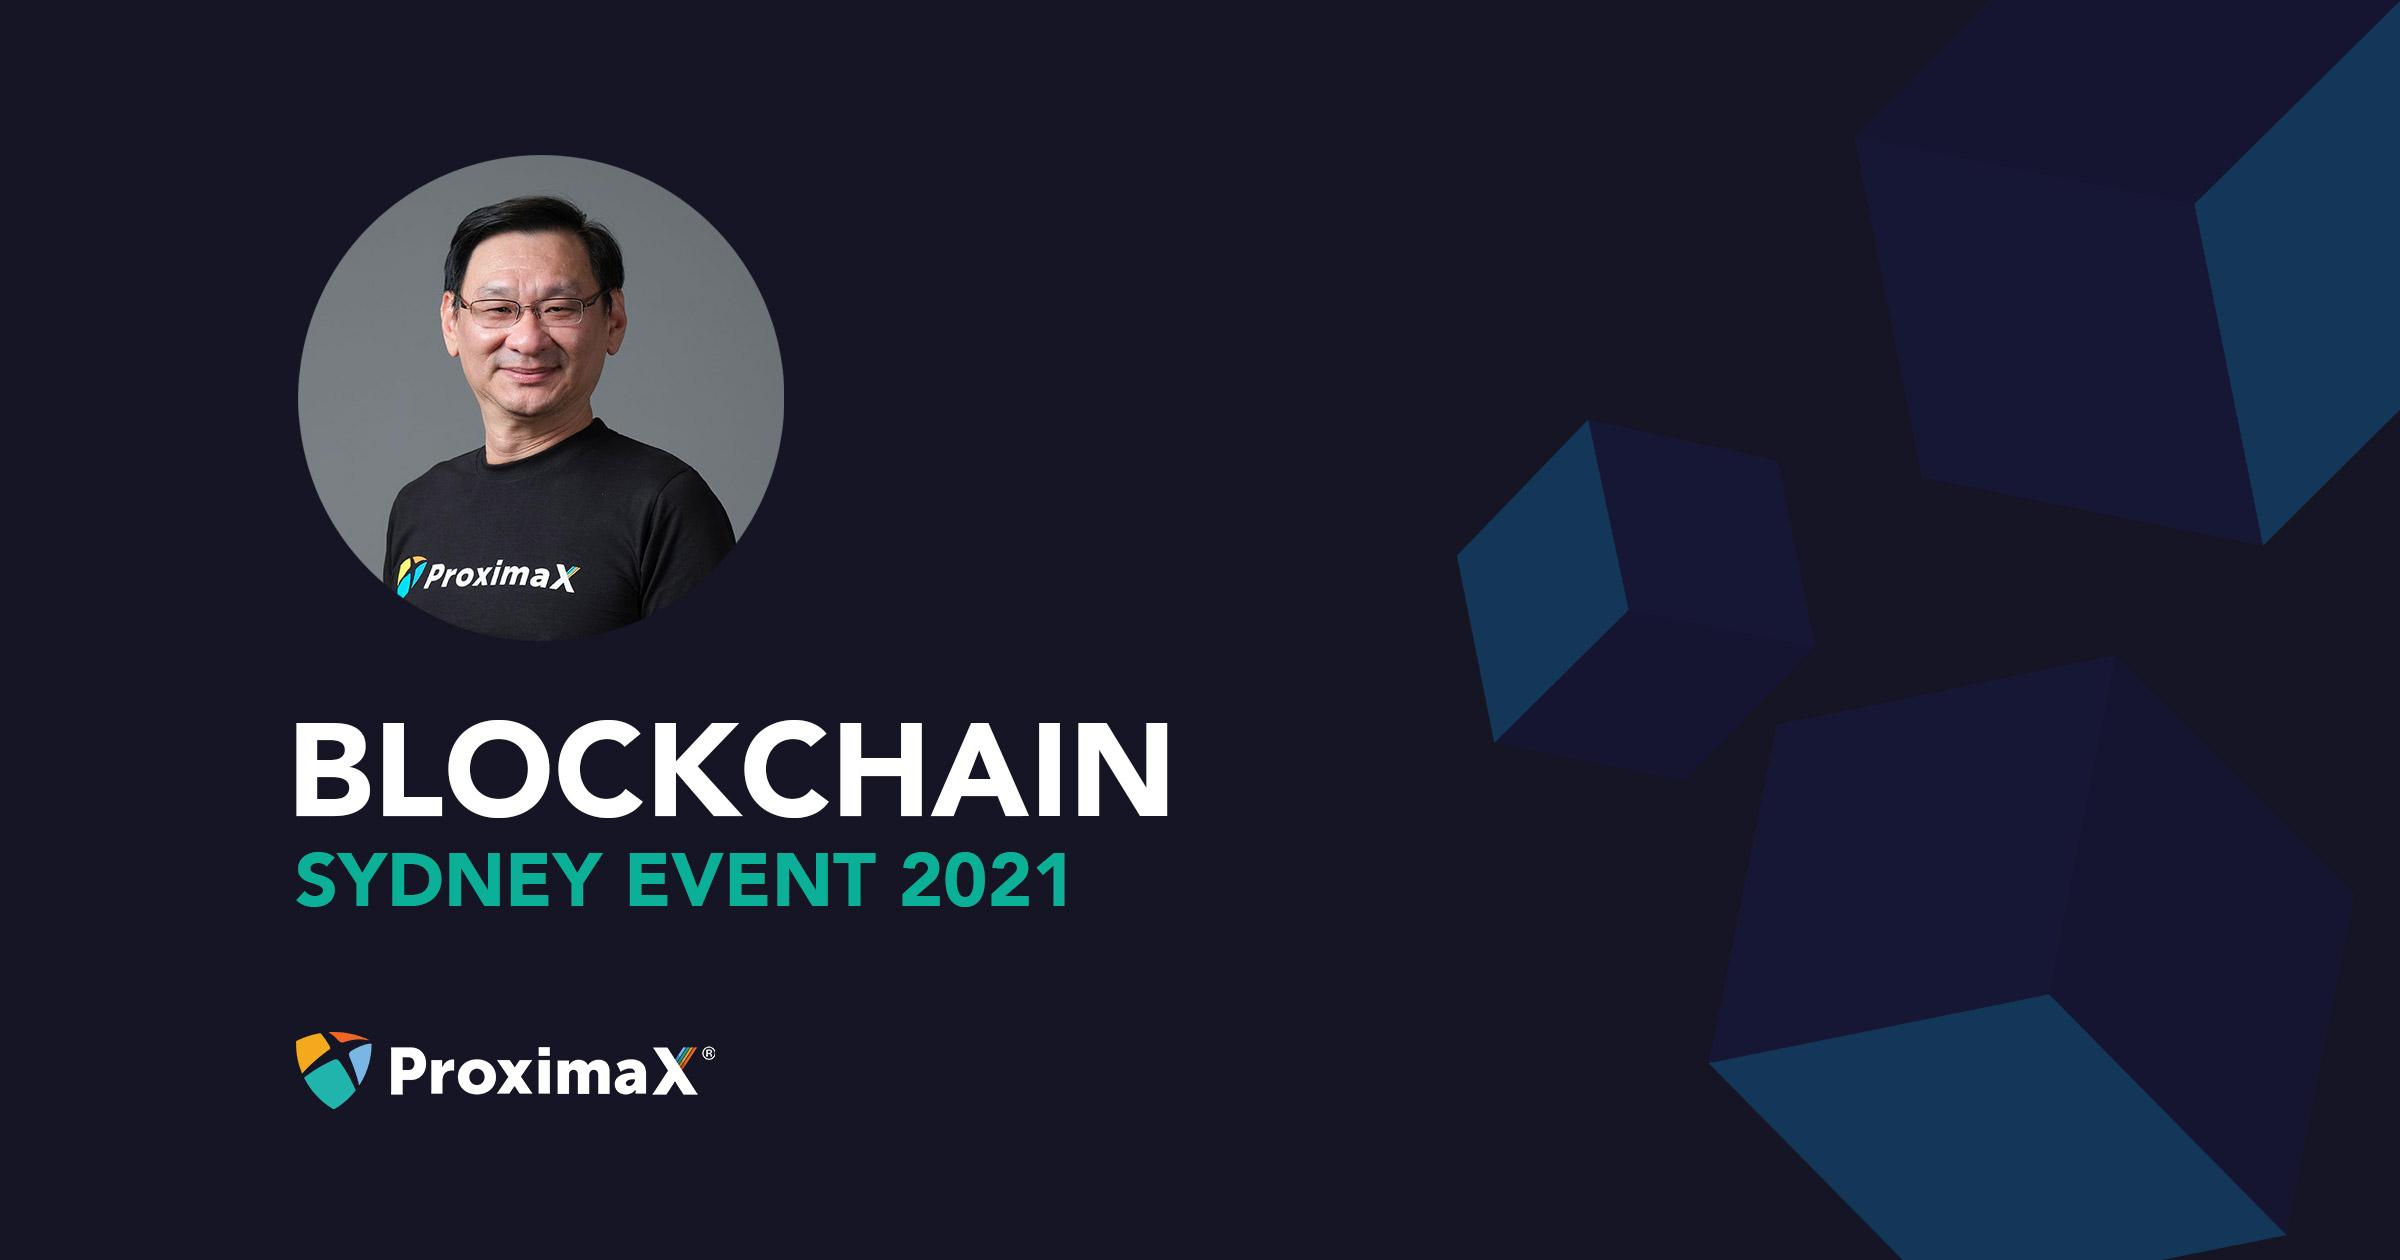 Blockchain Sydney Event 2021